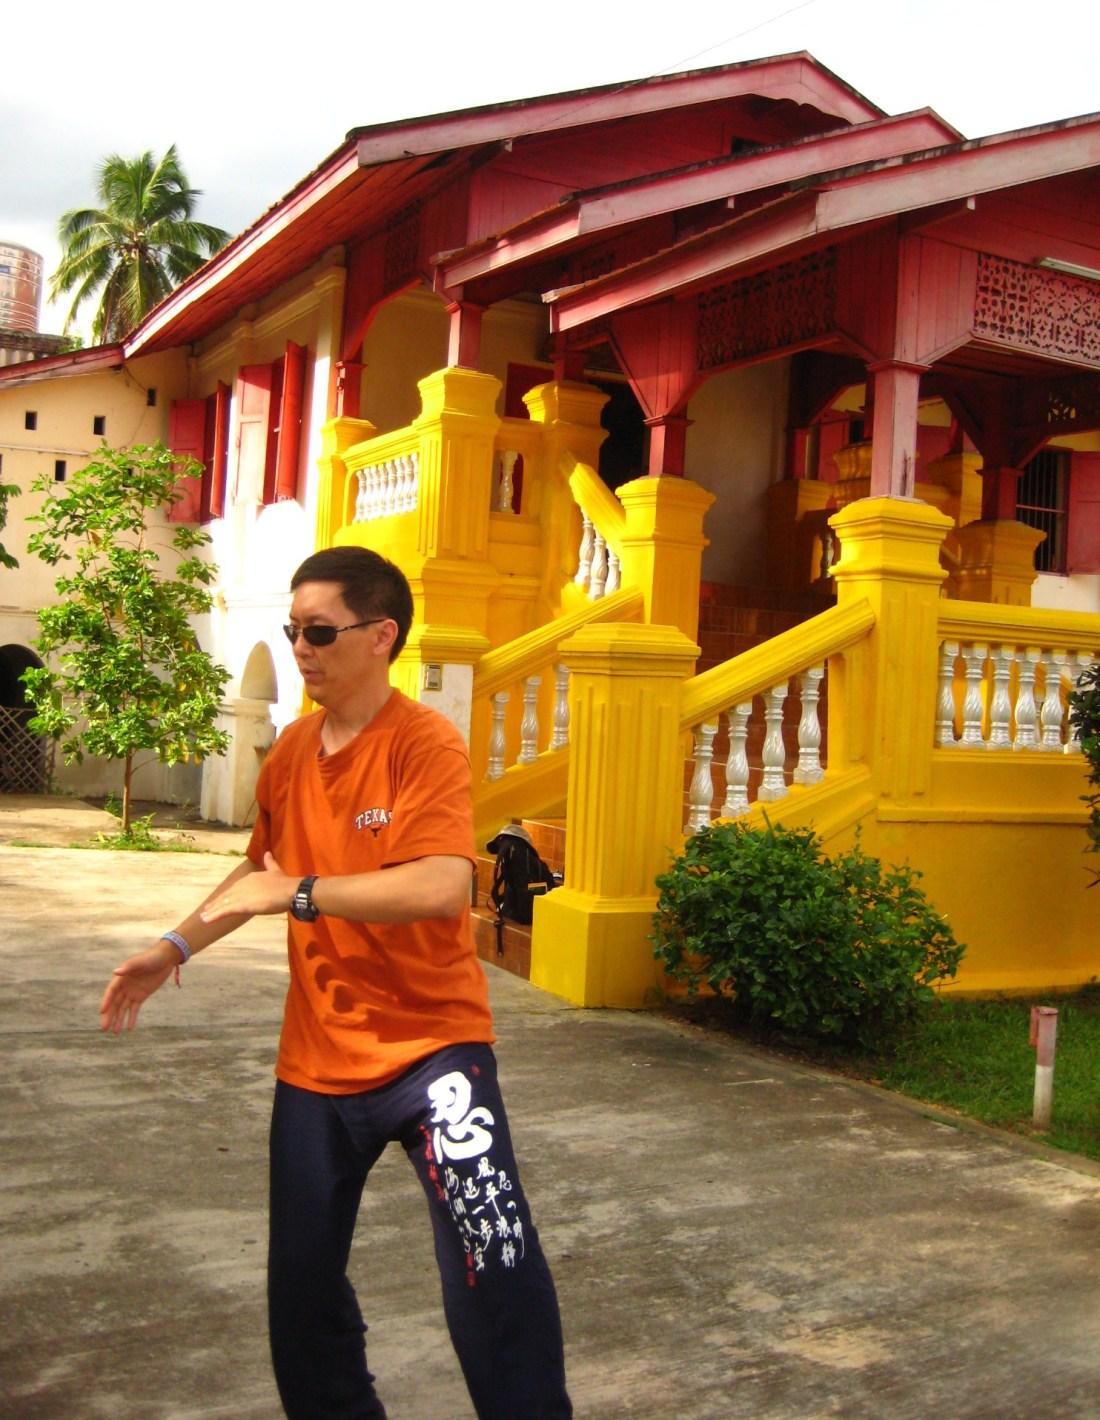 Burmese Buddhist Temple, Chiang Mai, Thailand Summer 2009